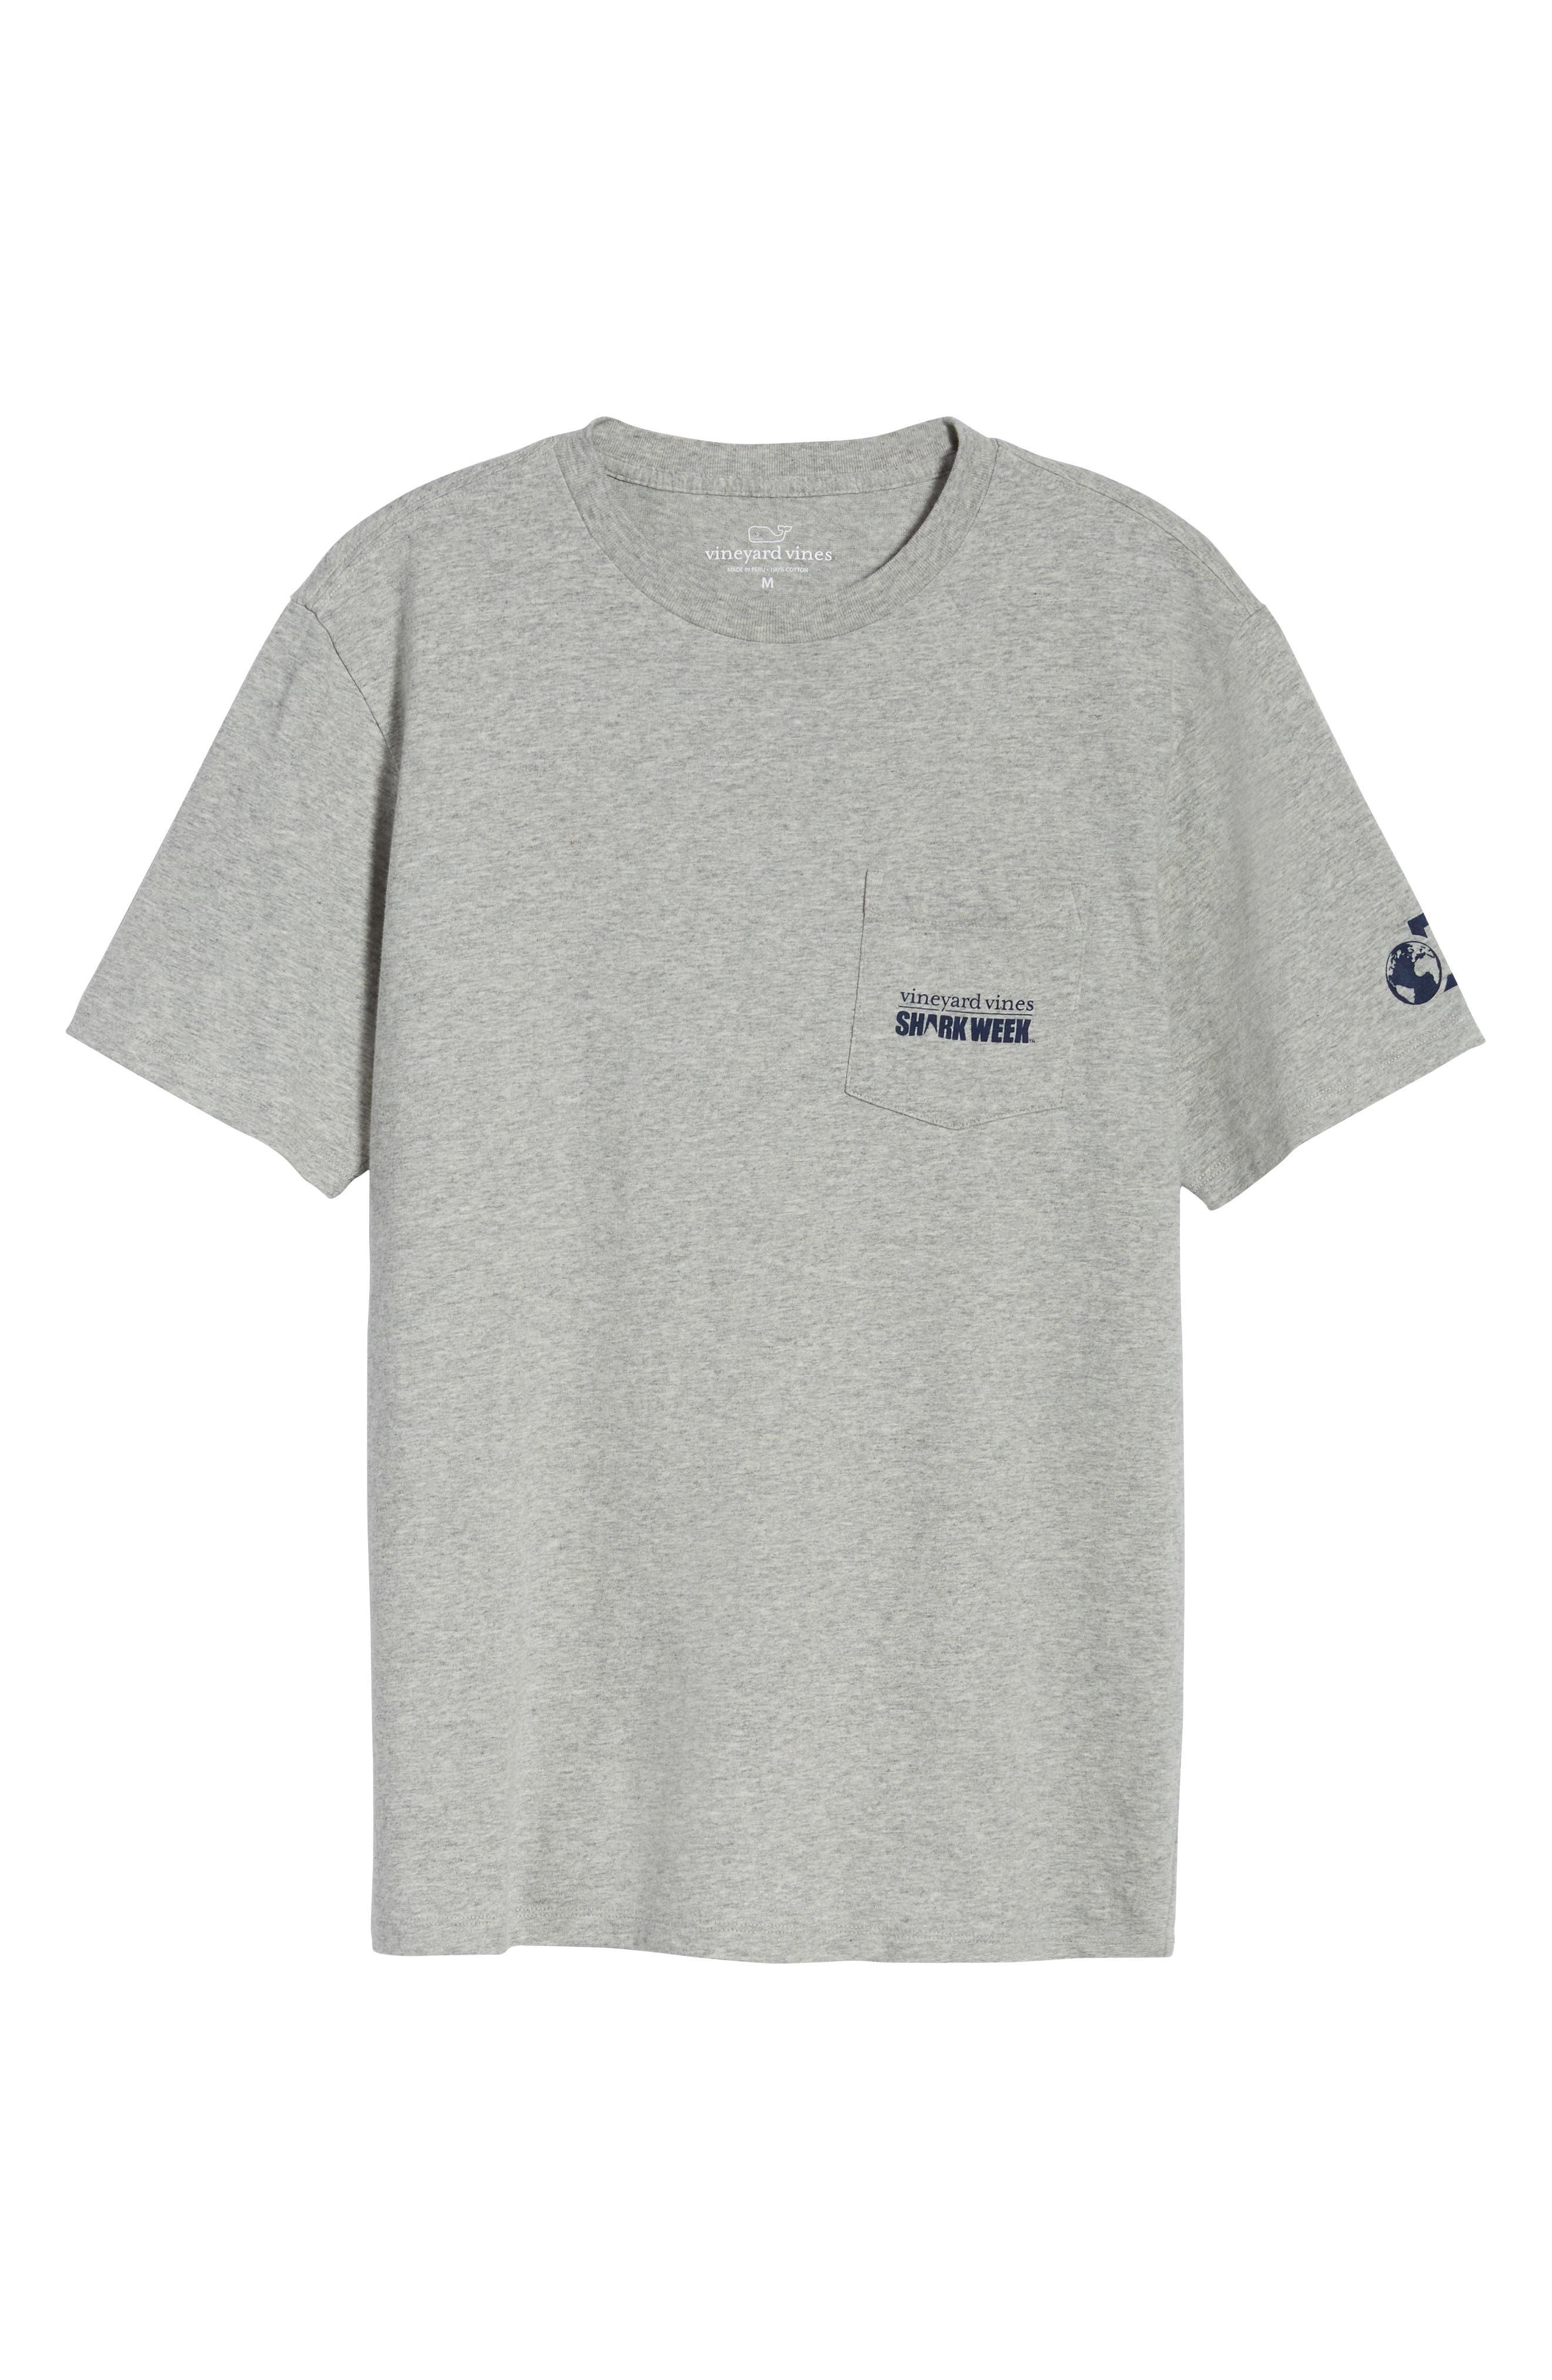 x Shark Week<sup>™</sup> Sharks & Stripes Pocket T-Shirt,                             Alternate thumbnail 5, color,                             Grey Heather